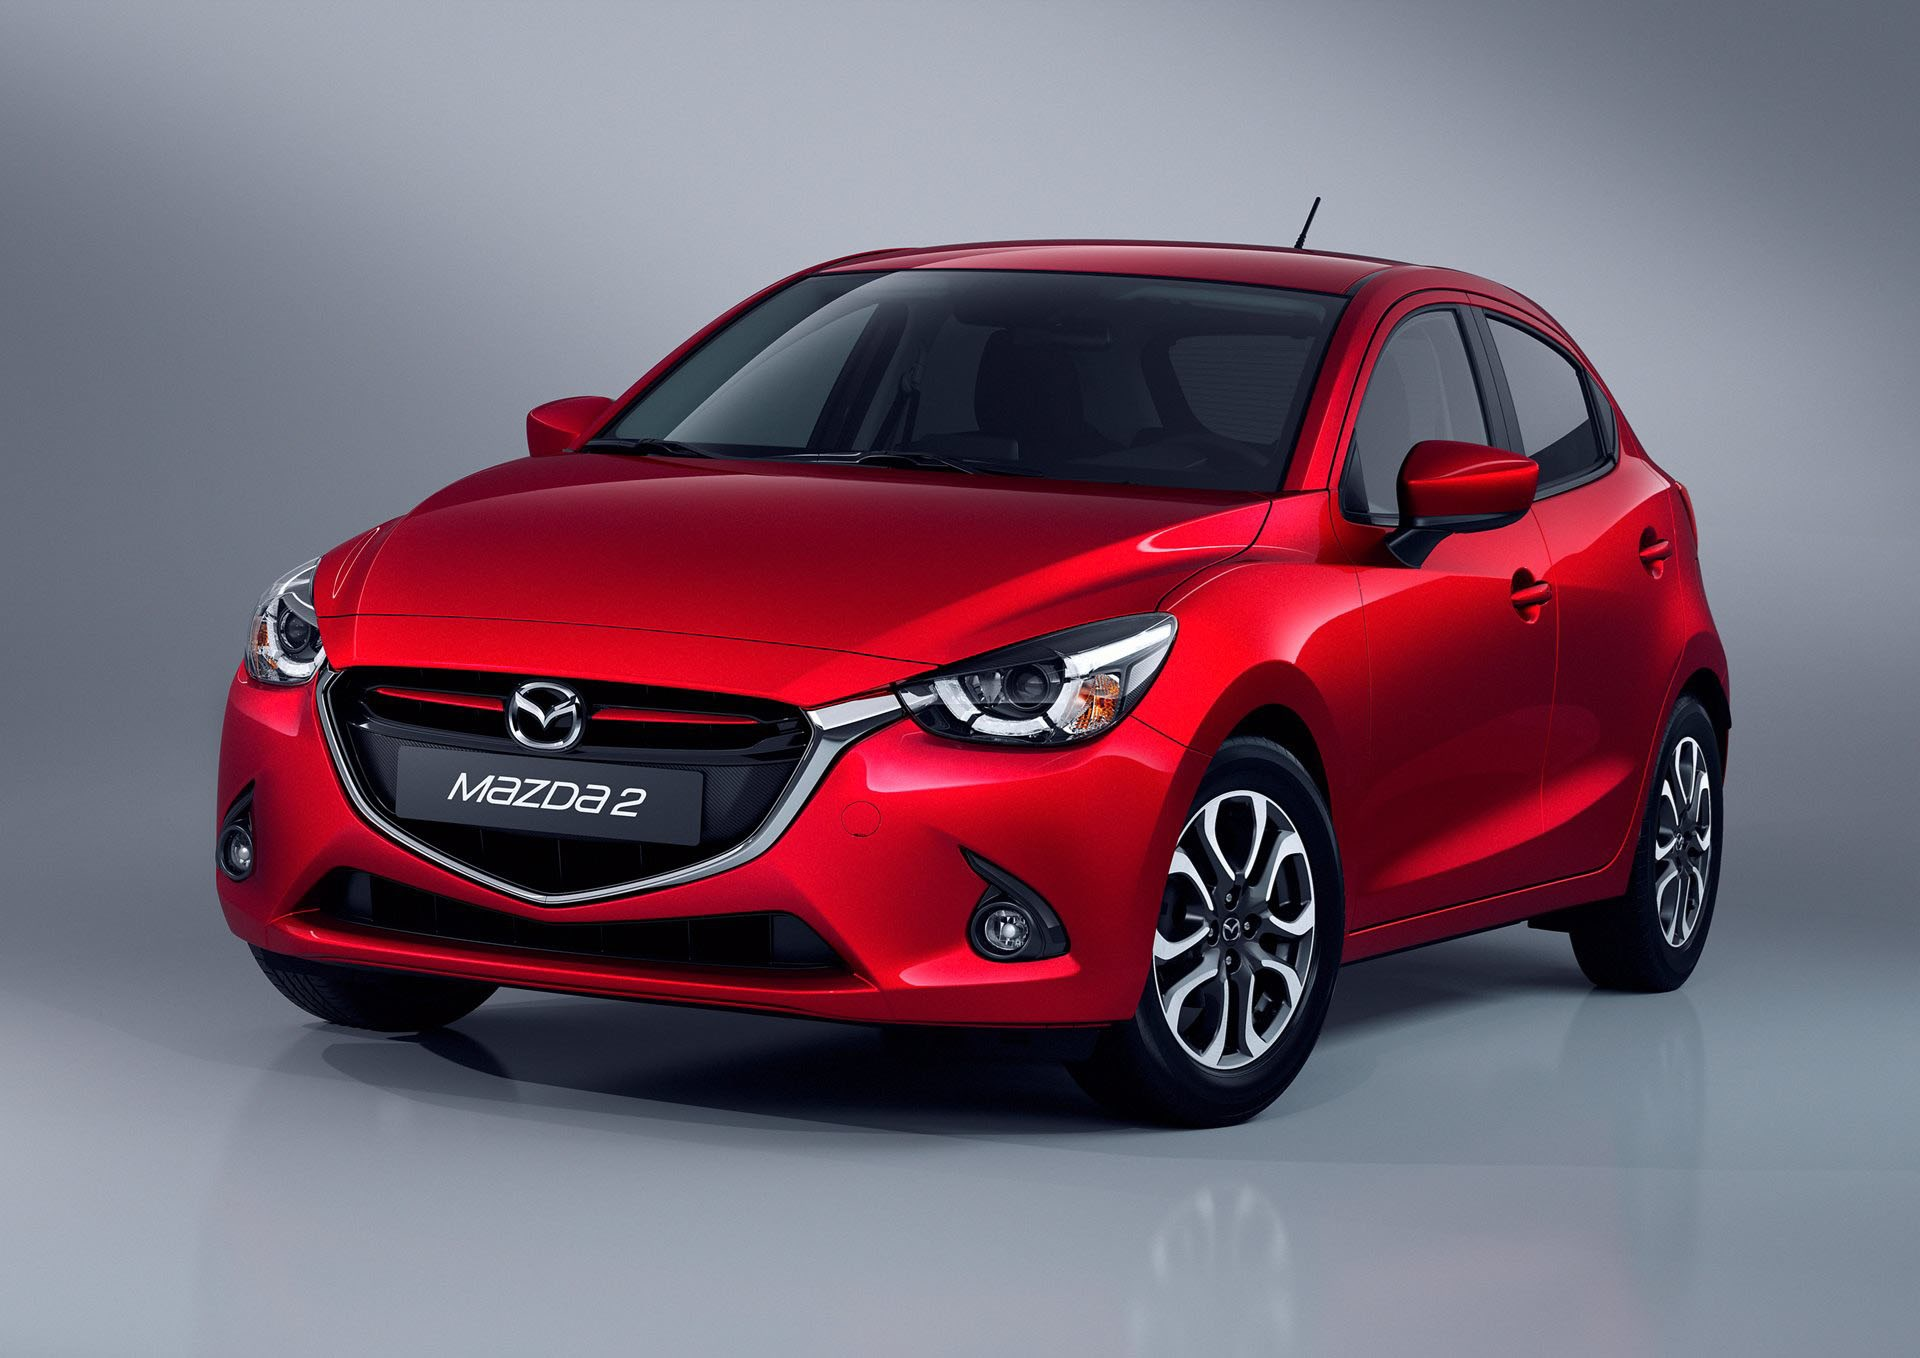 Kelebihan Kekurangan Mazda 2 Review